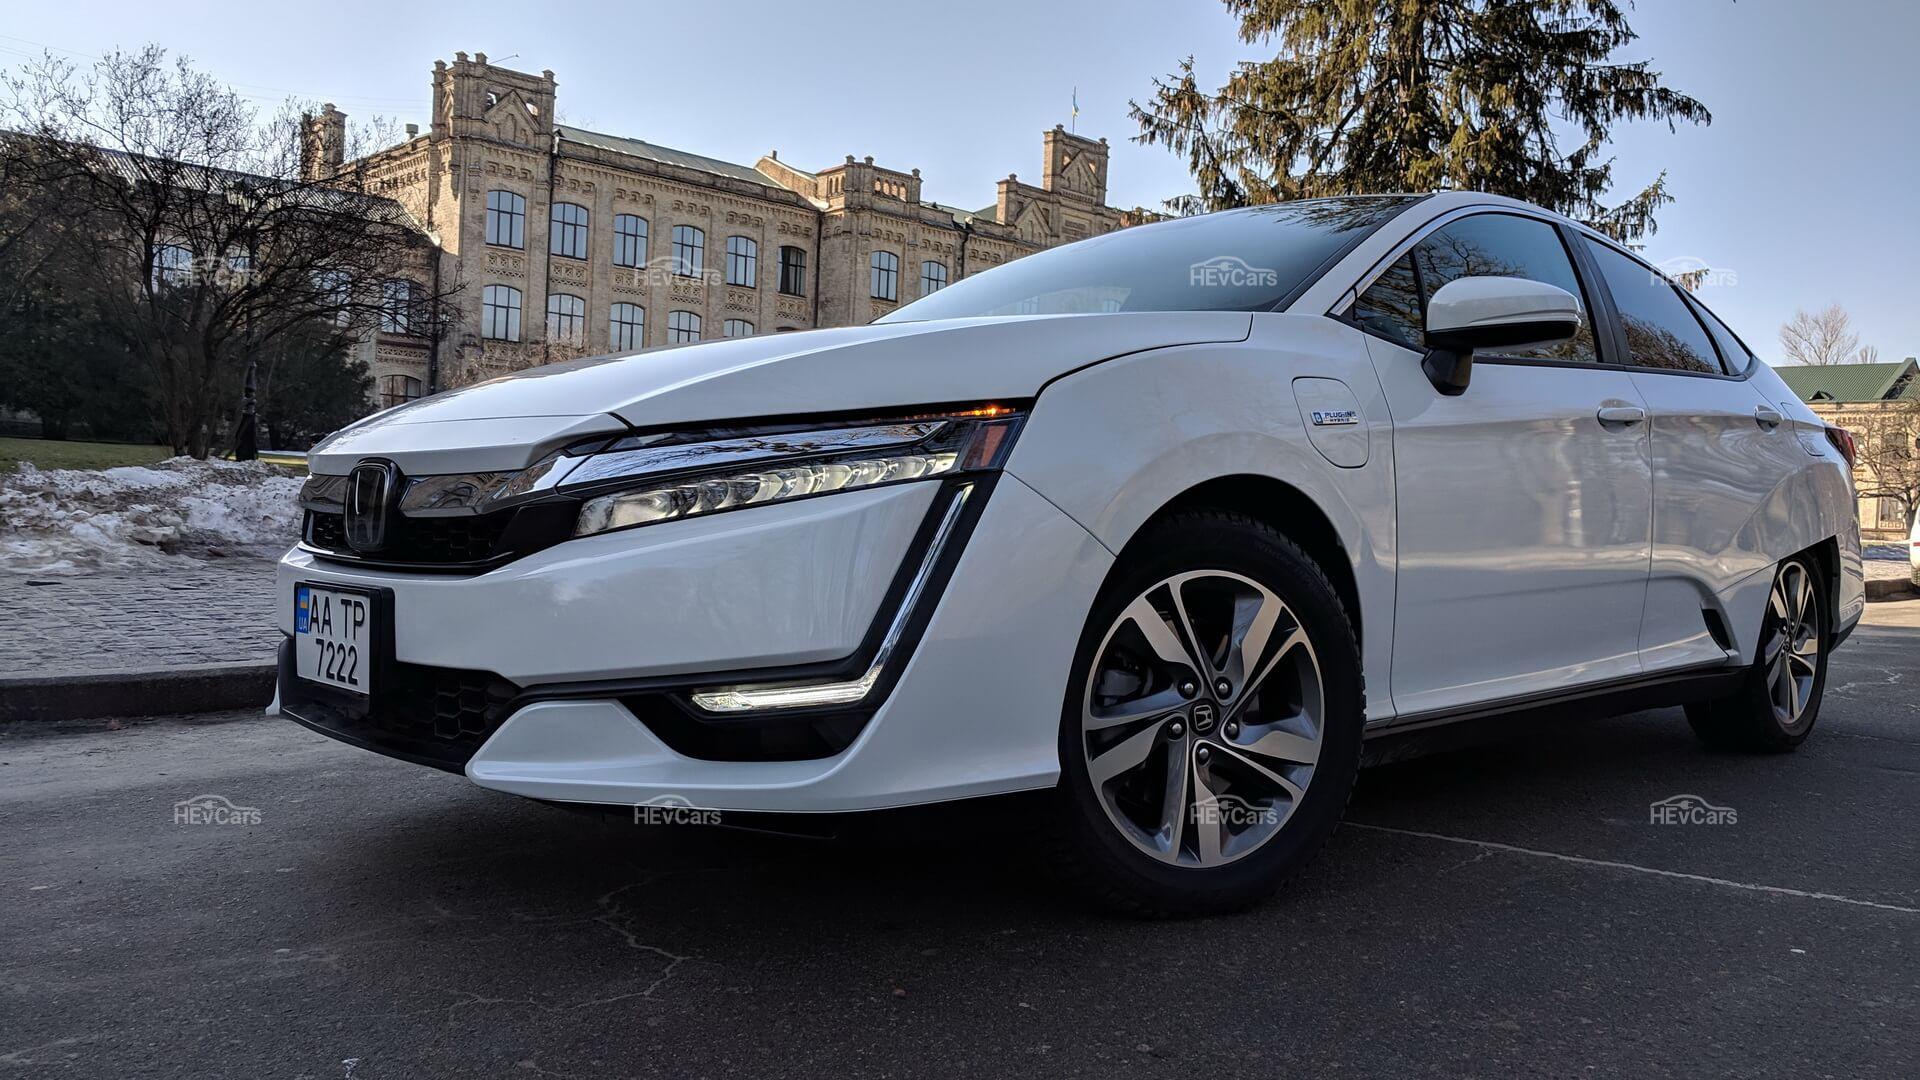 Экстерьер плагин-гибрида Honda Clarity PHEV